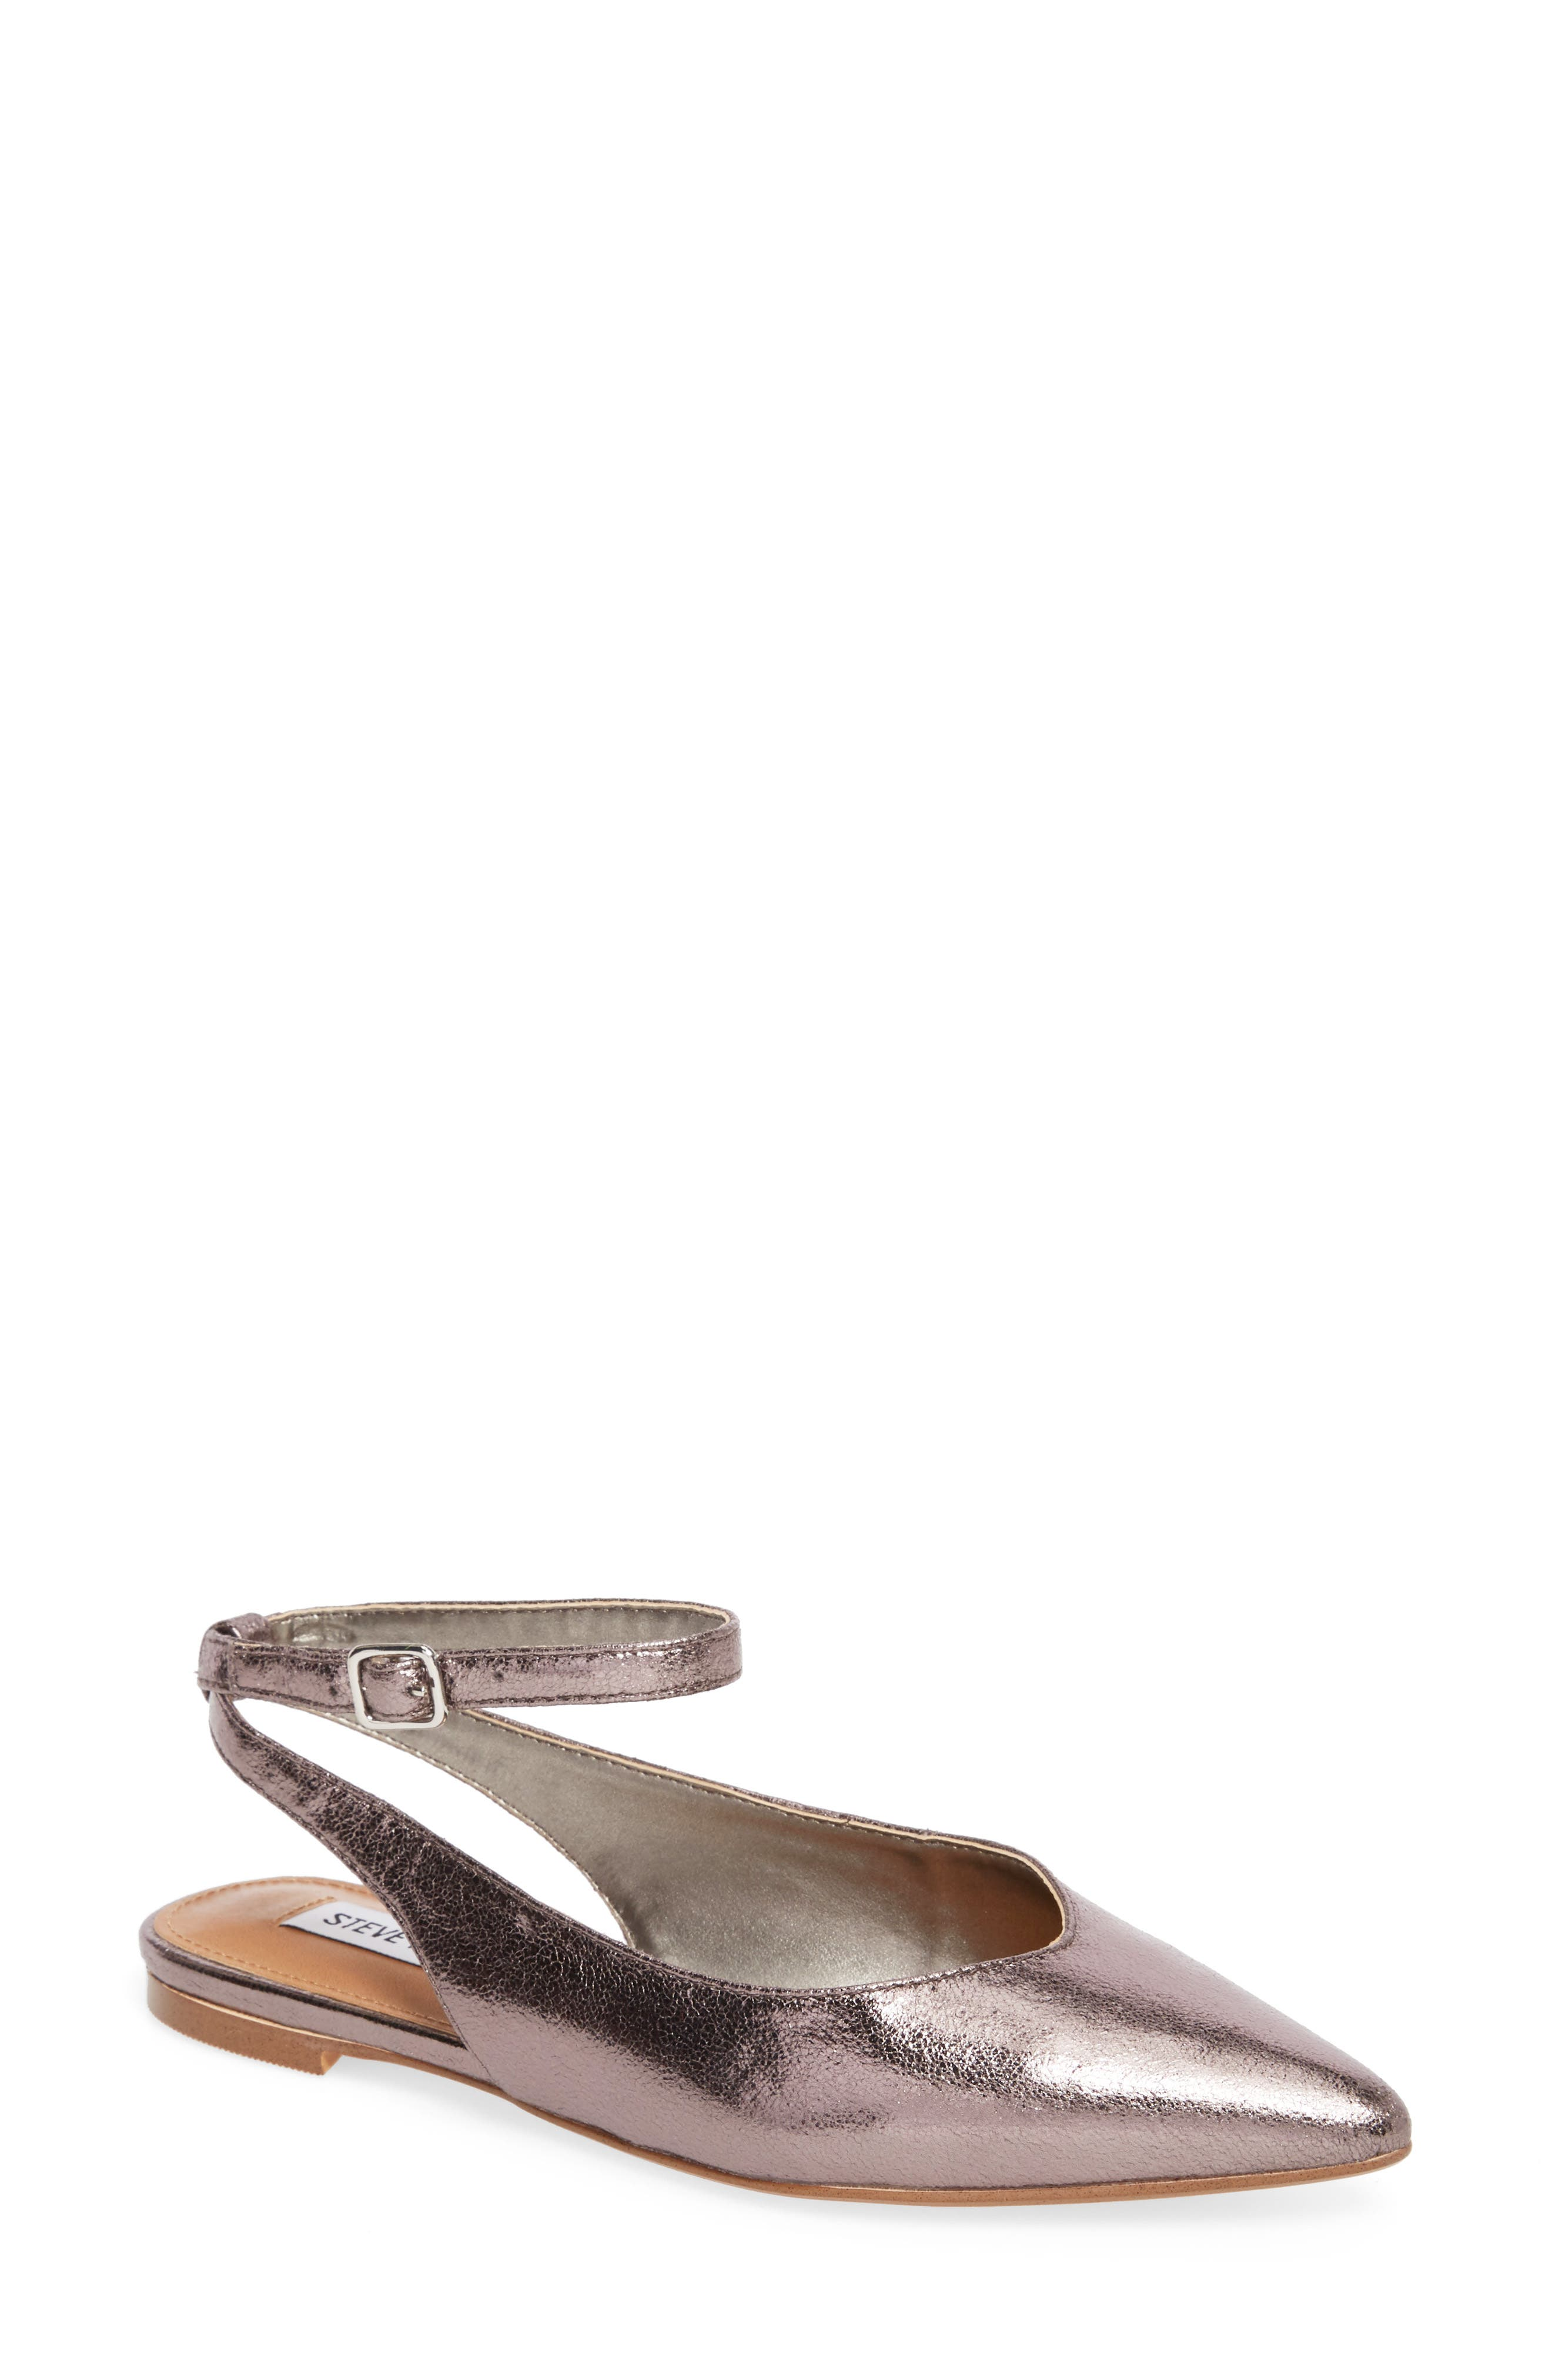 Steve Madden Cupid Ankle Strap Flat (Women)